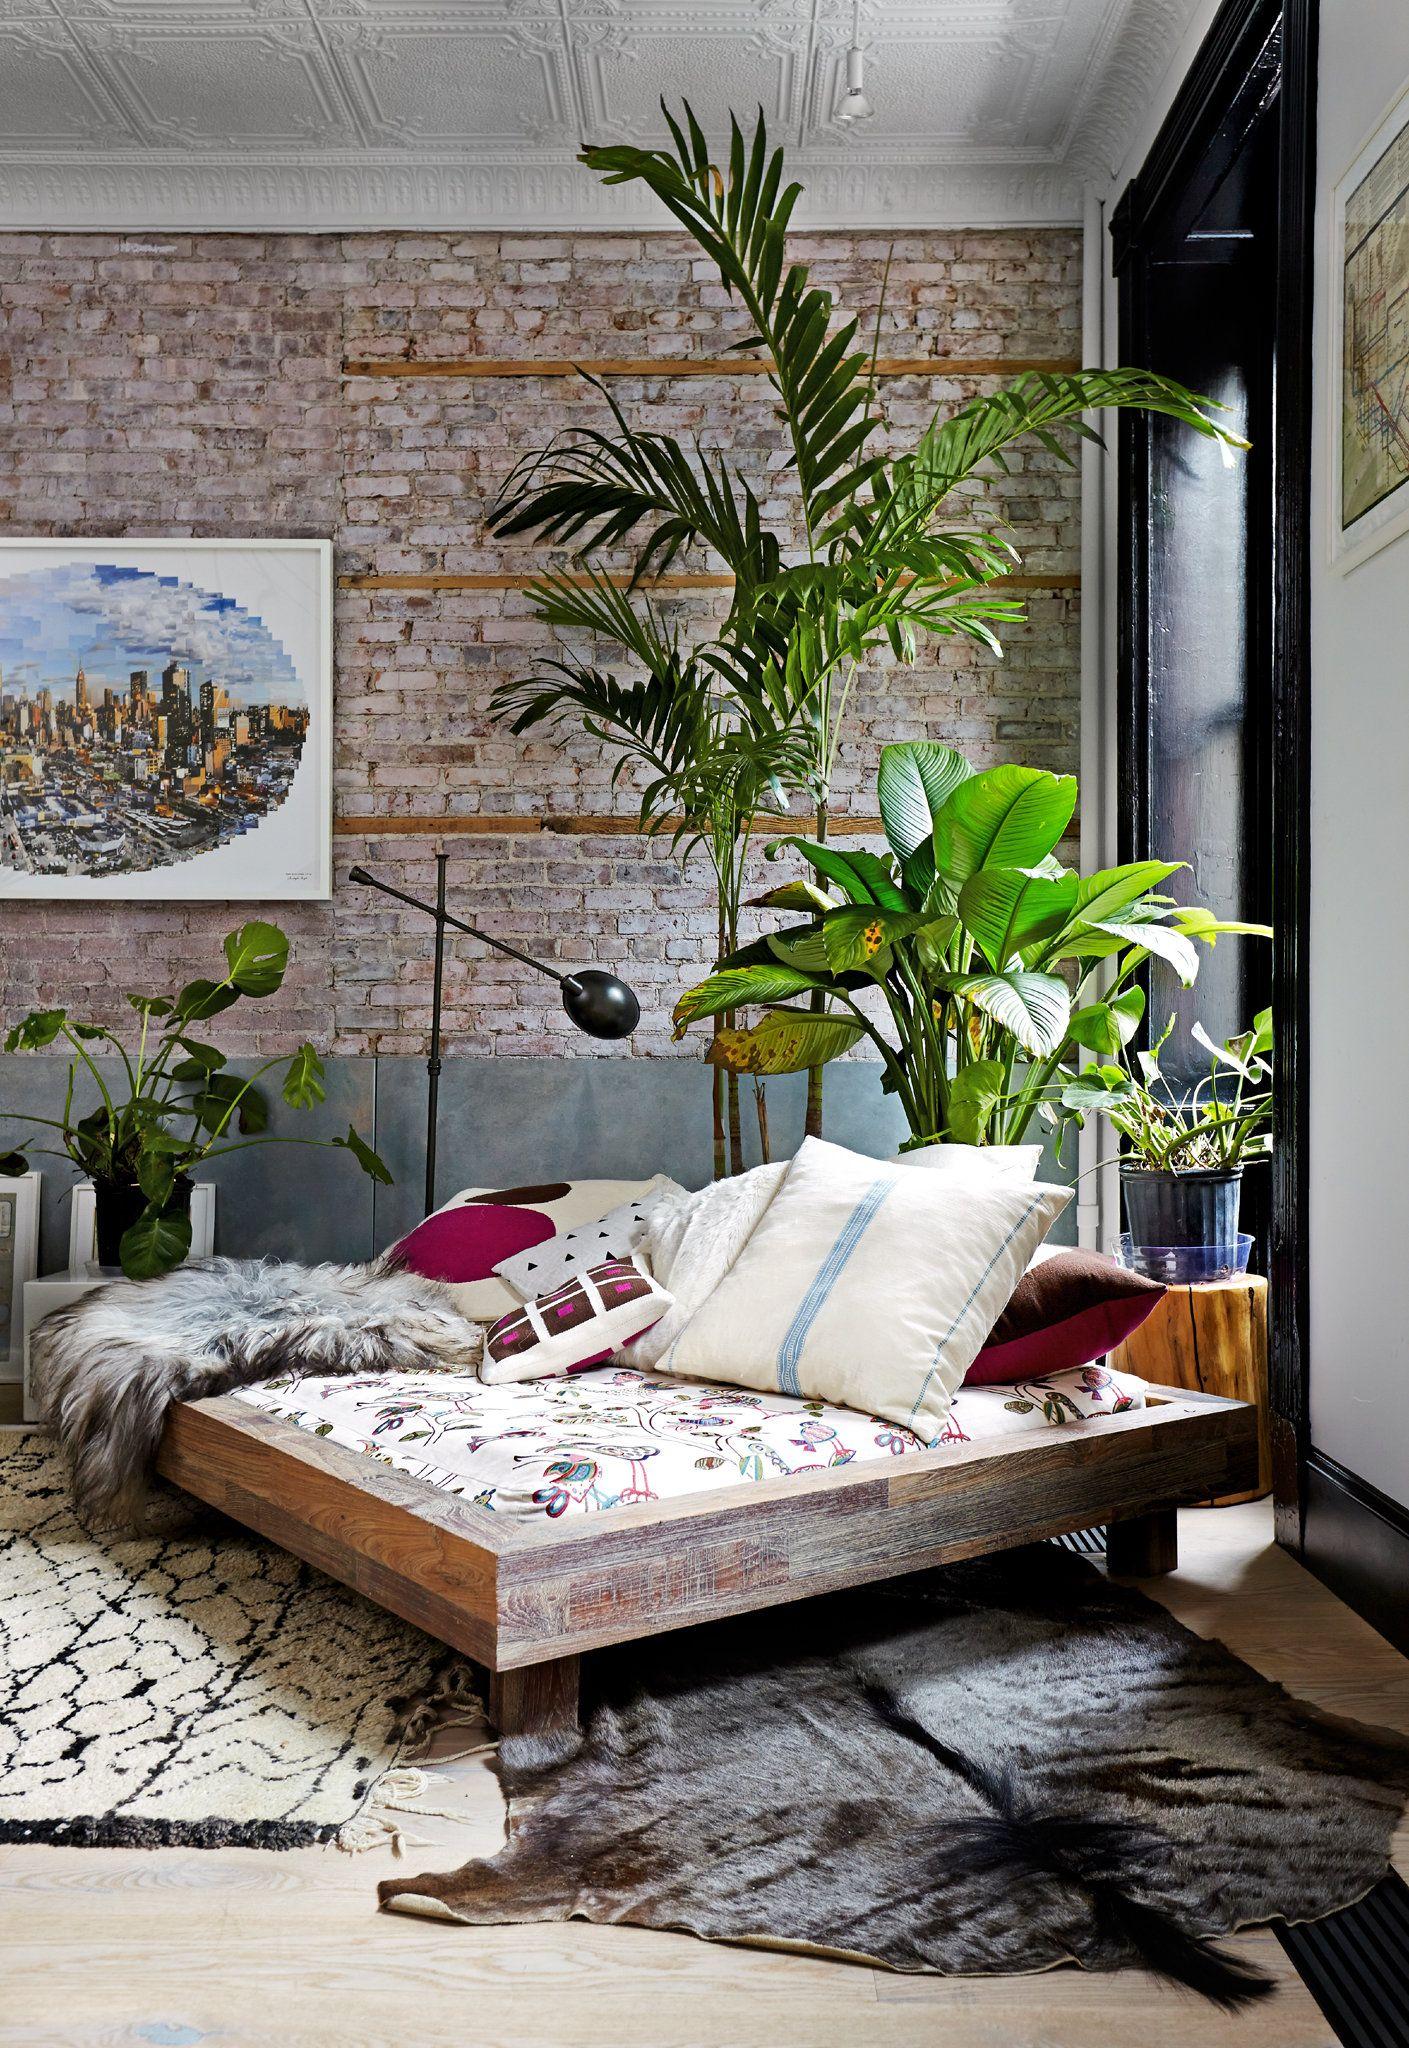 Boho loft bedroom  A Victorian Loft With Creature Comforts  Lofts Creature comforts